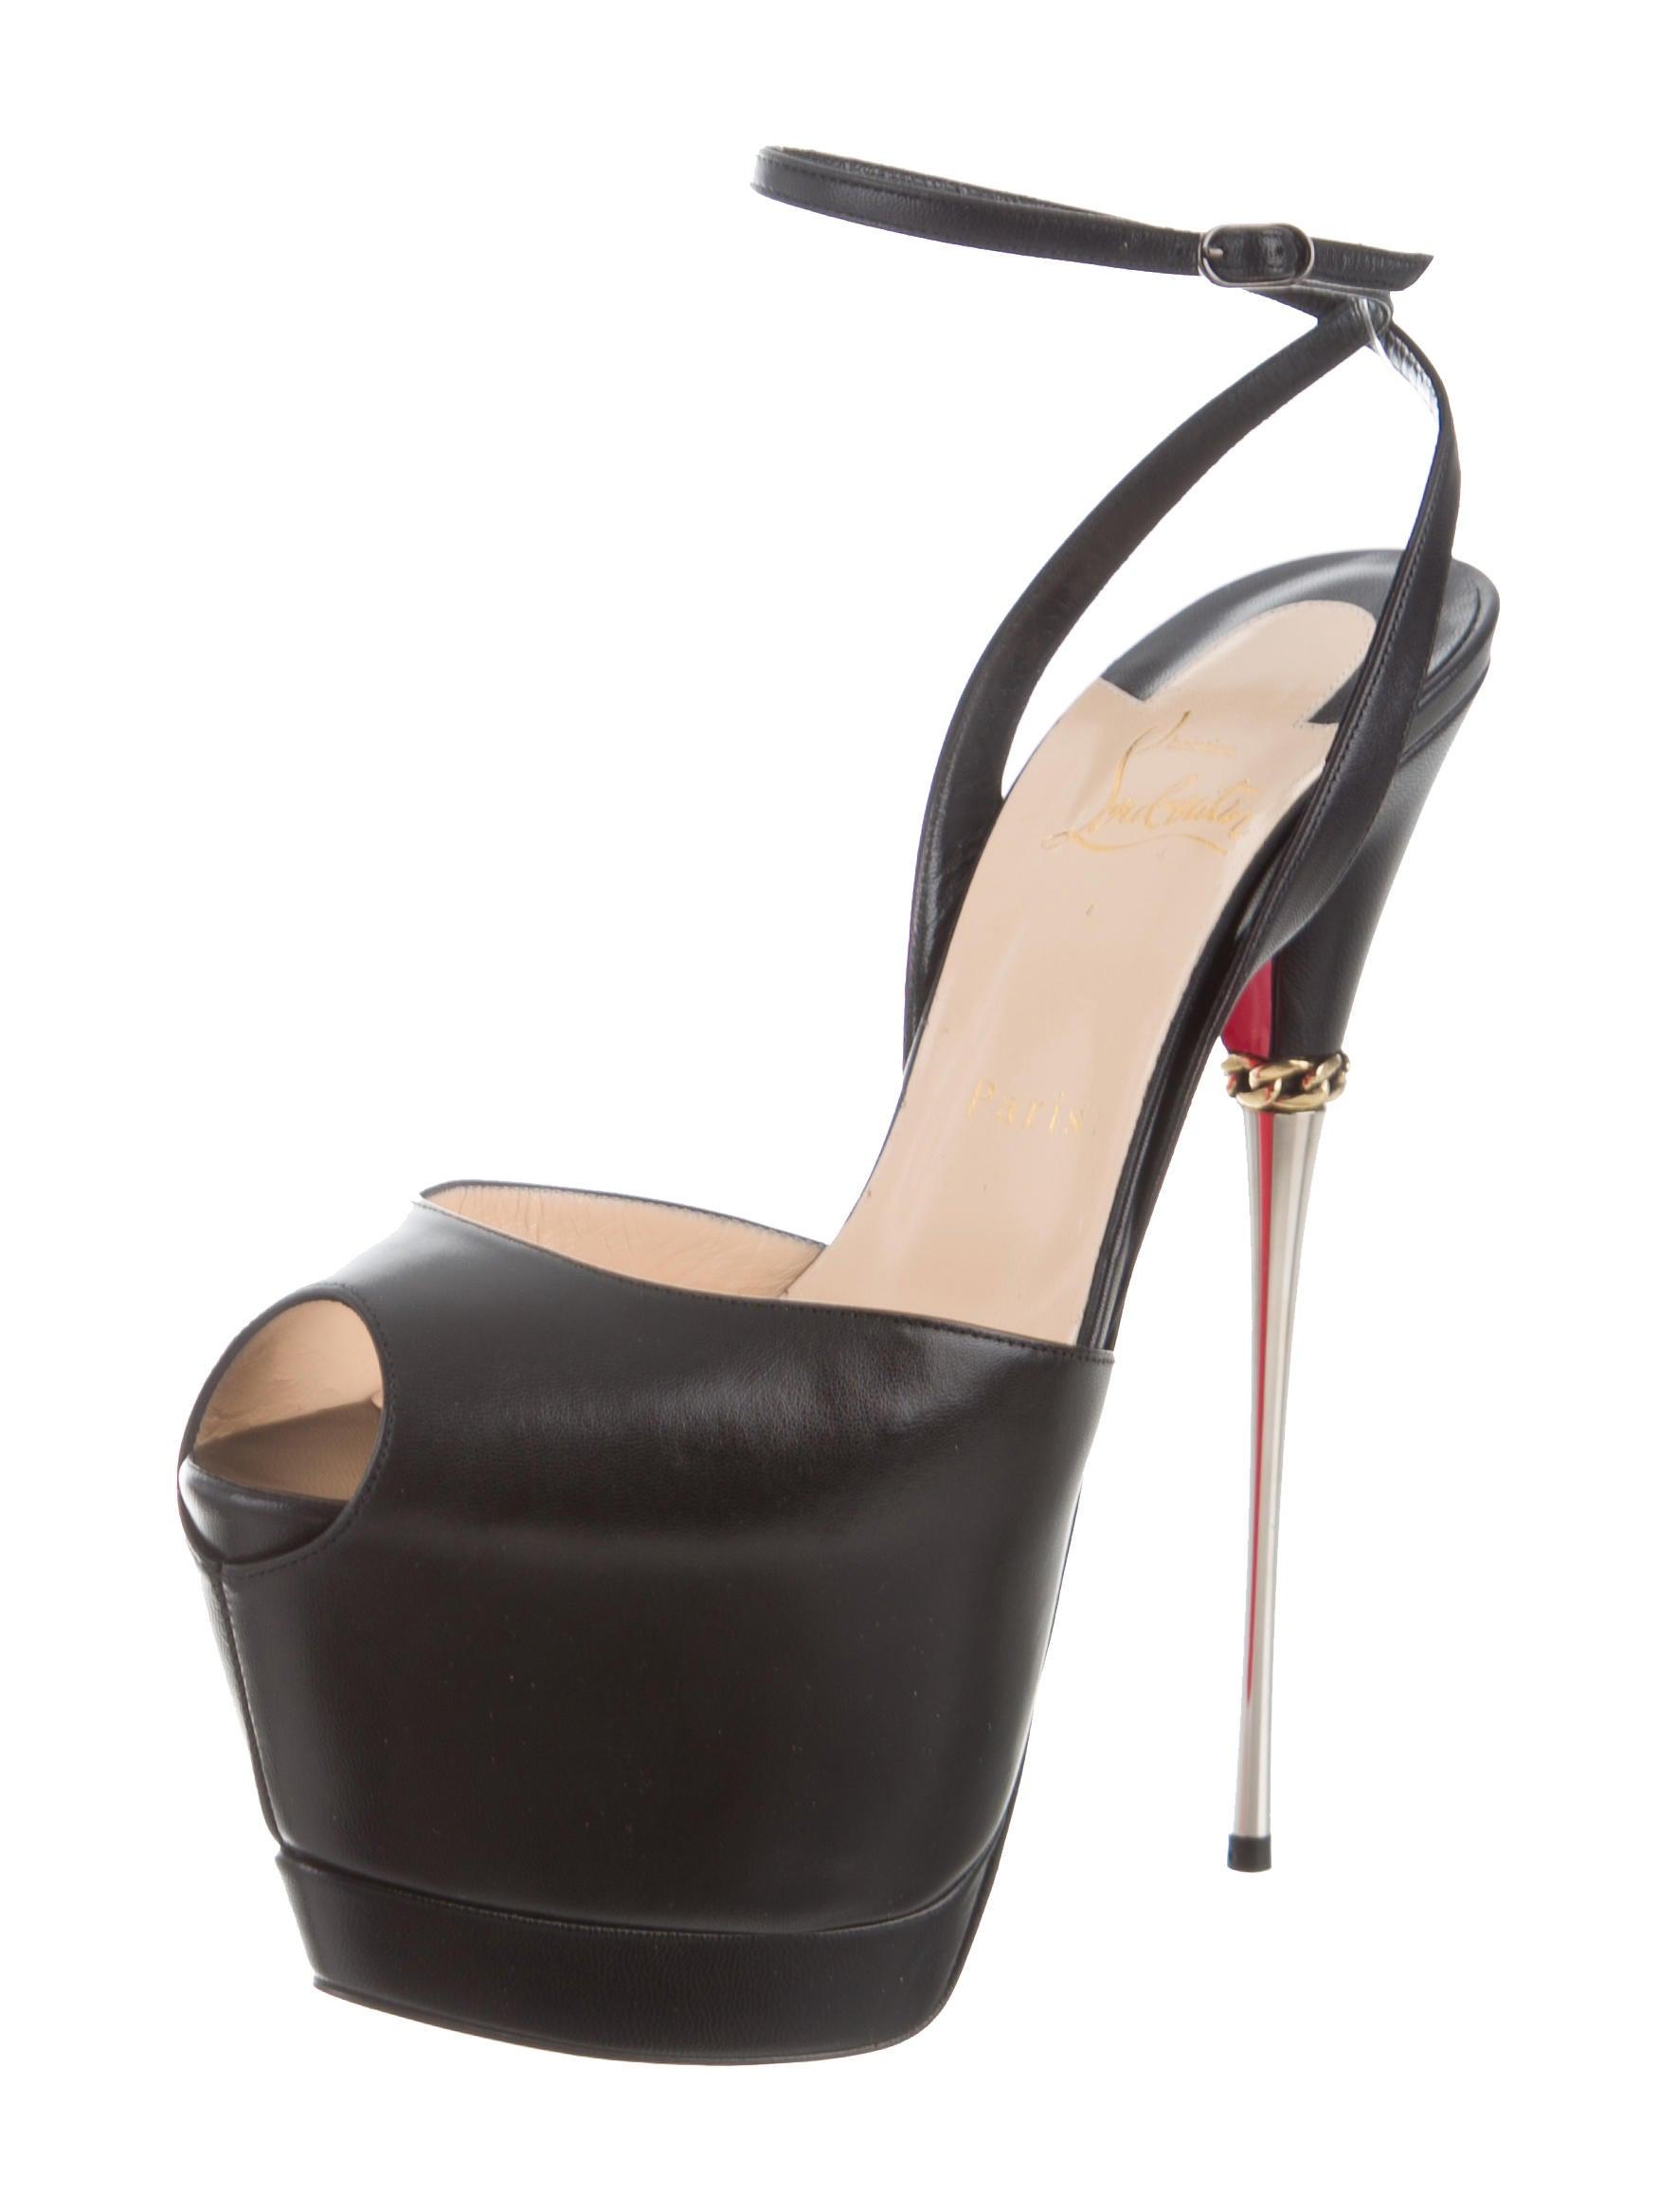 Christian Louboutin Despressi Platform Sandals